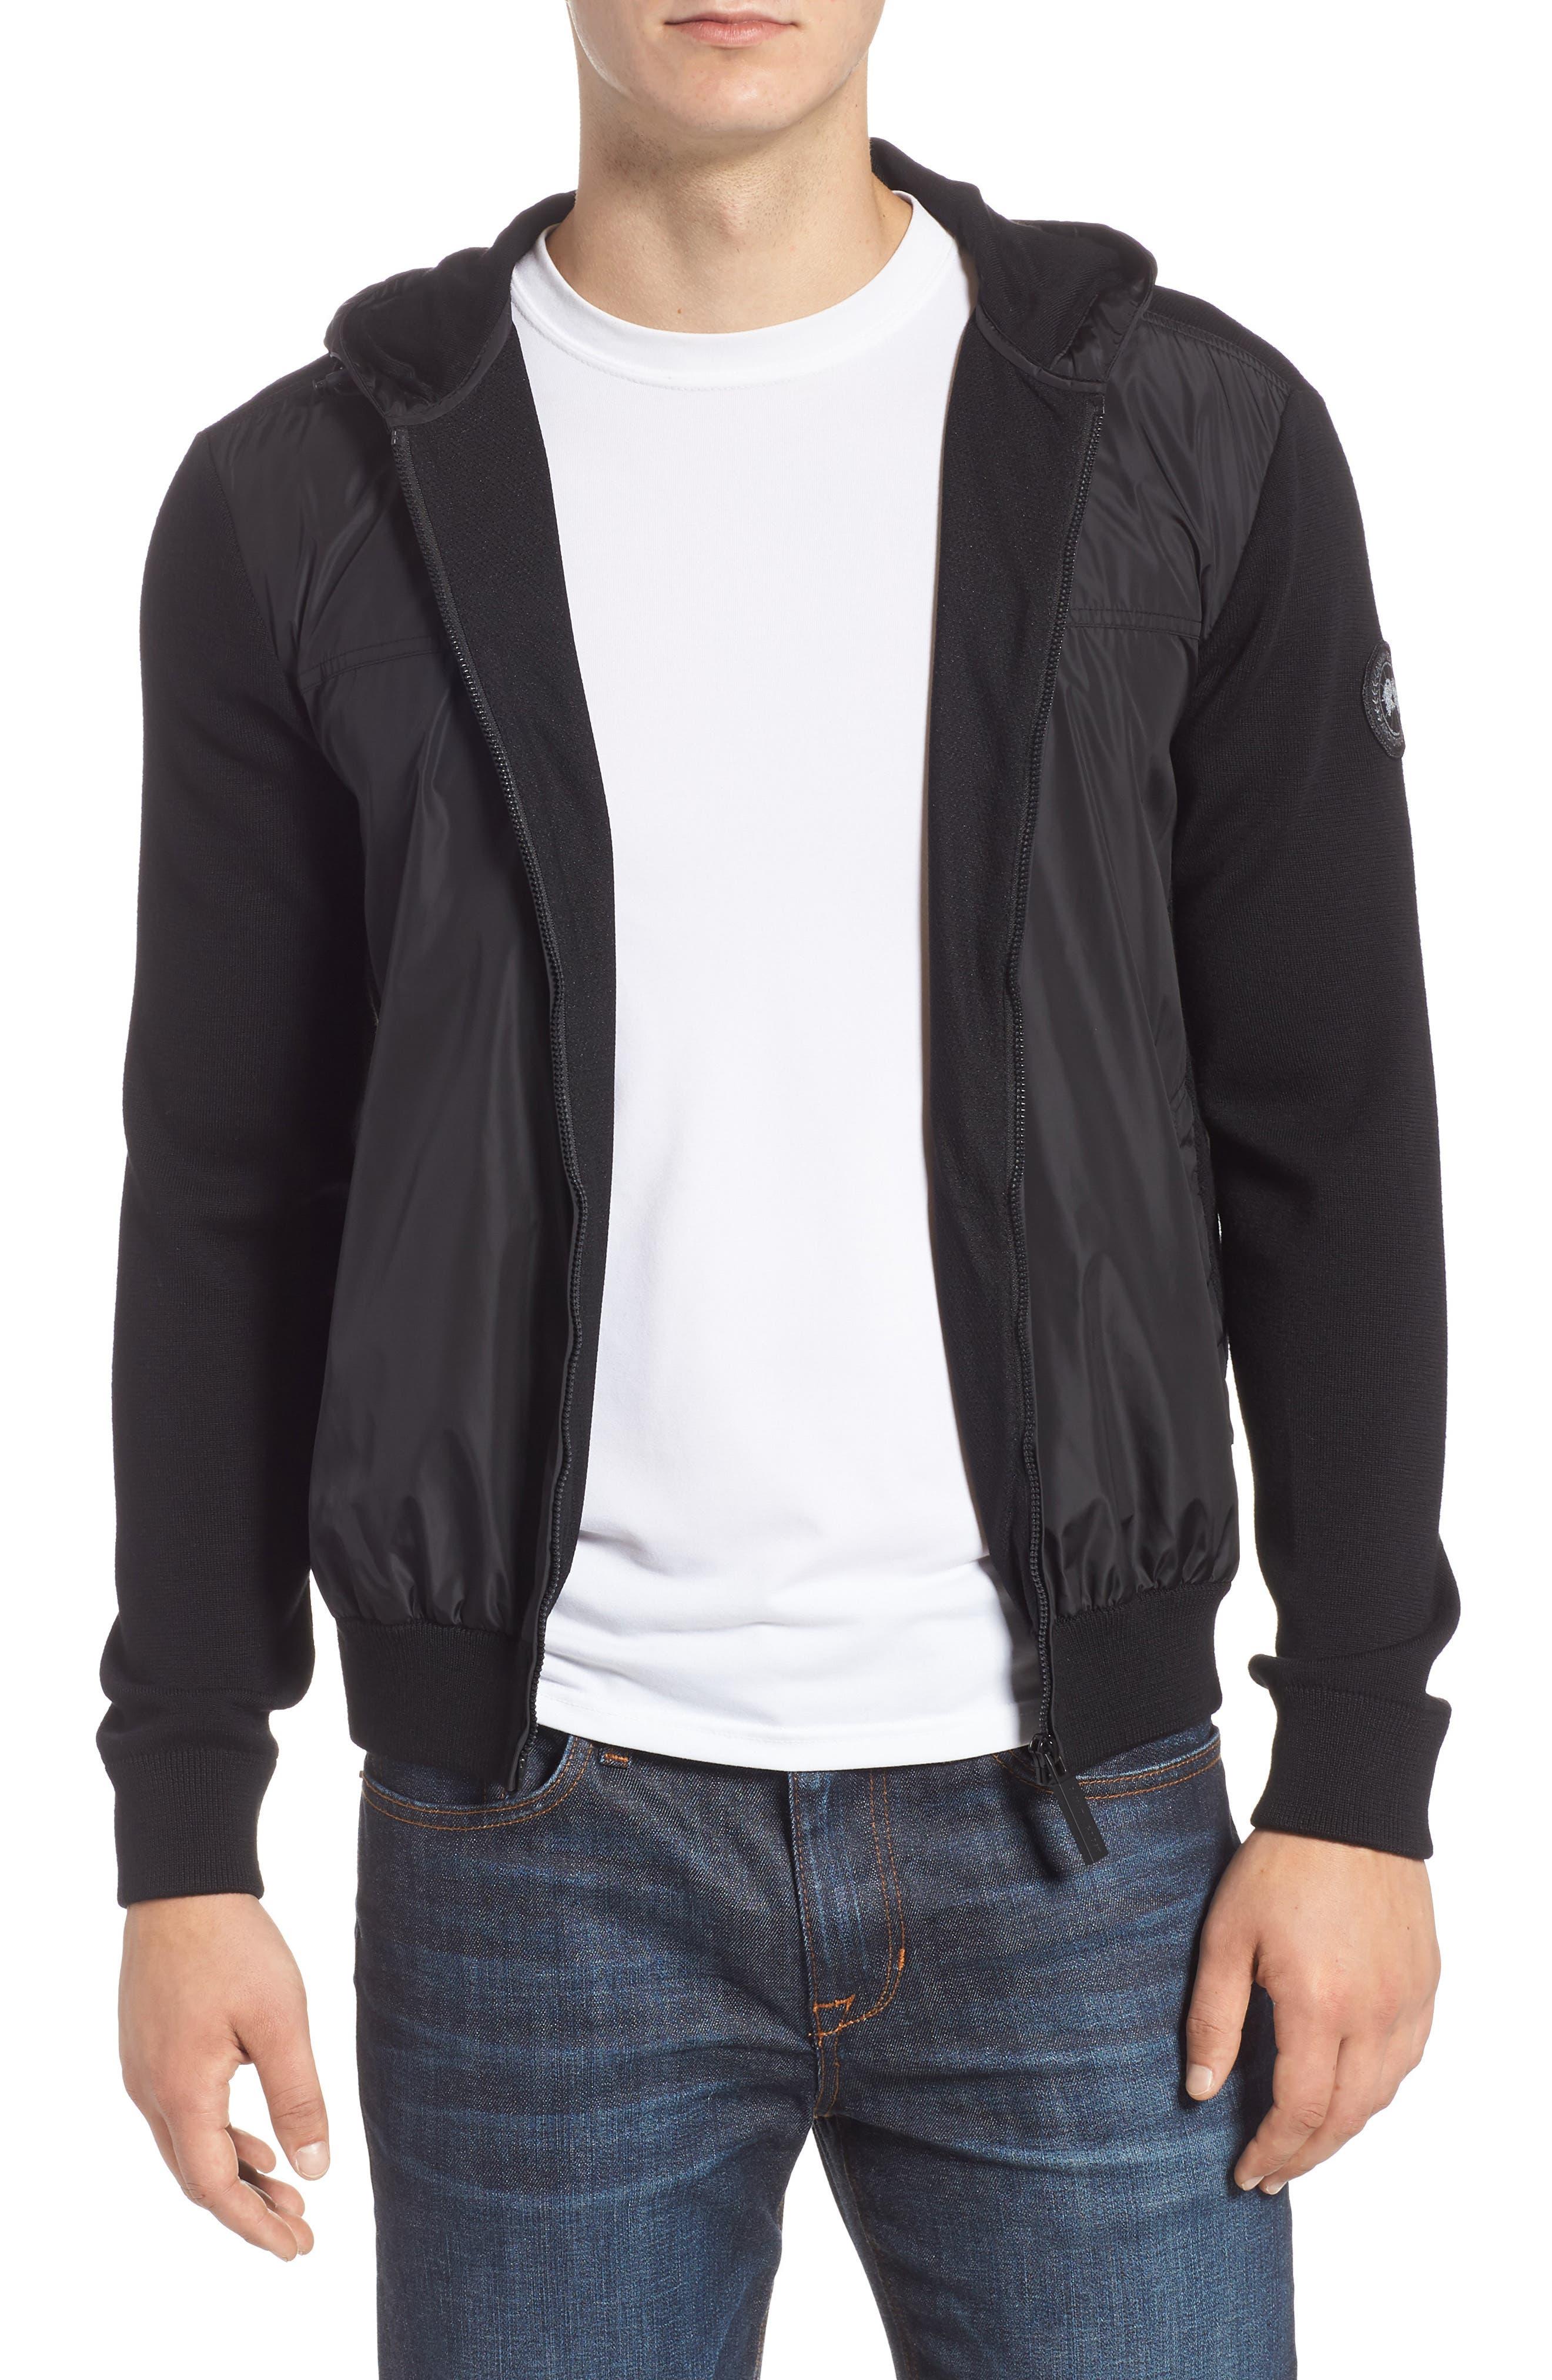 Windbridge Regular Fit Hooded Sweater Jacket,                             Main thumbnail 1, color,                             BLACK